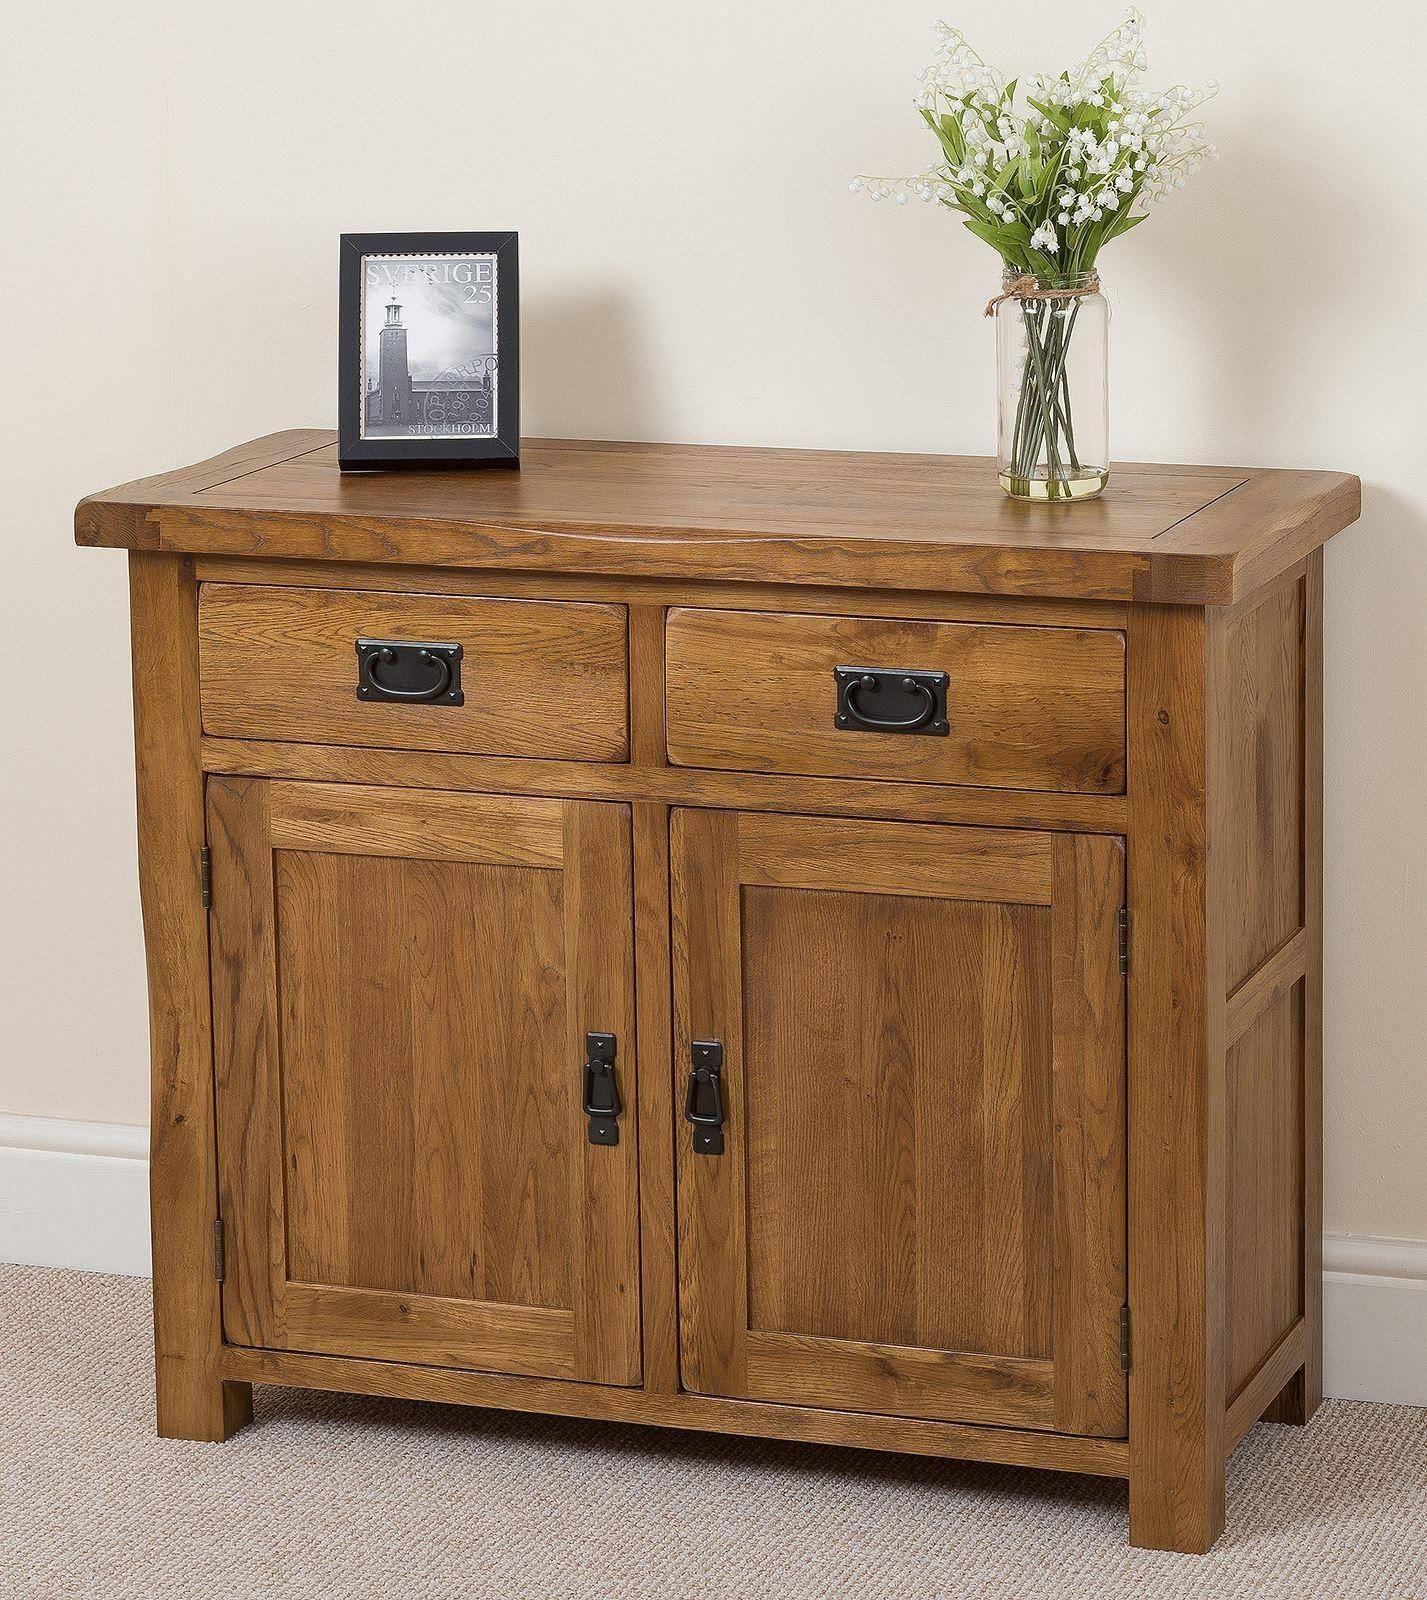 Popular Photo of Rustic Sideboard Furniture